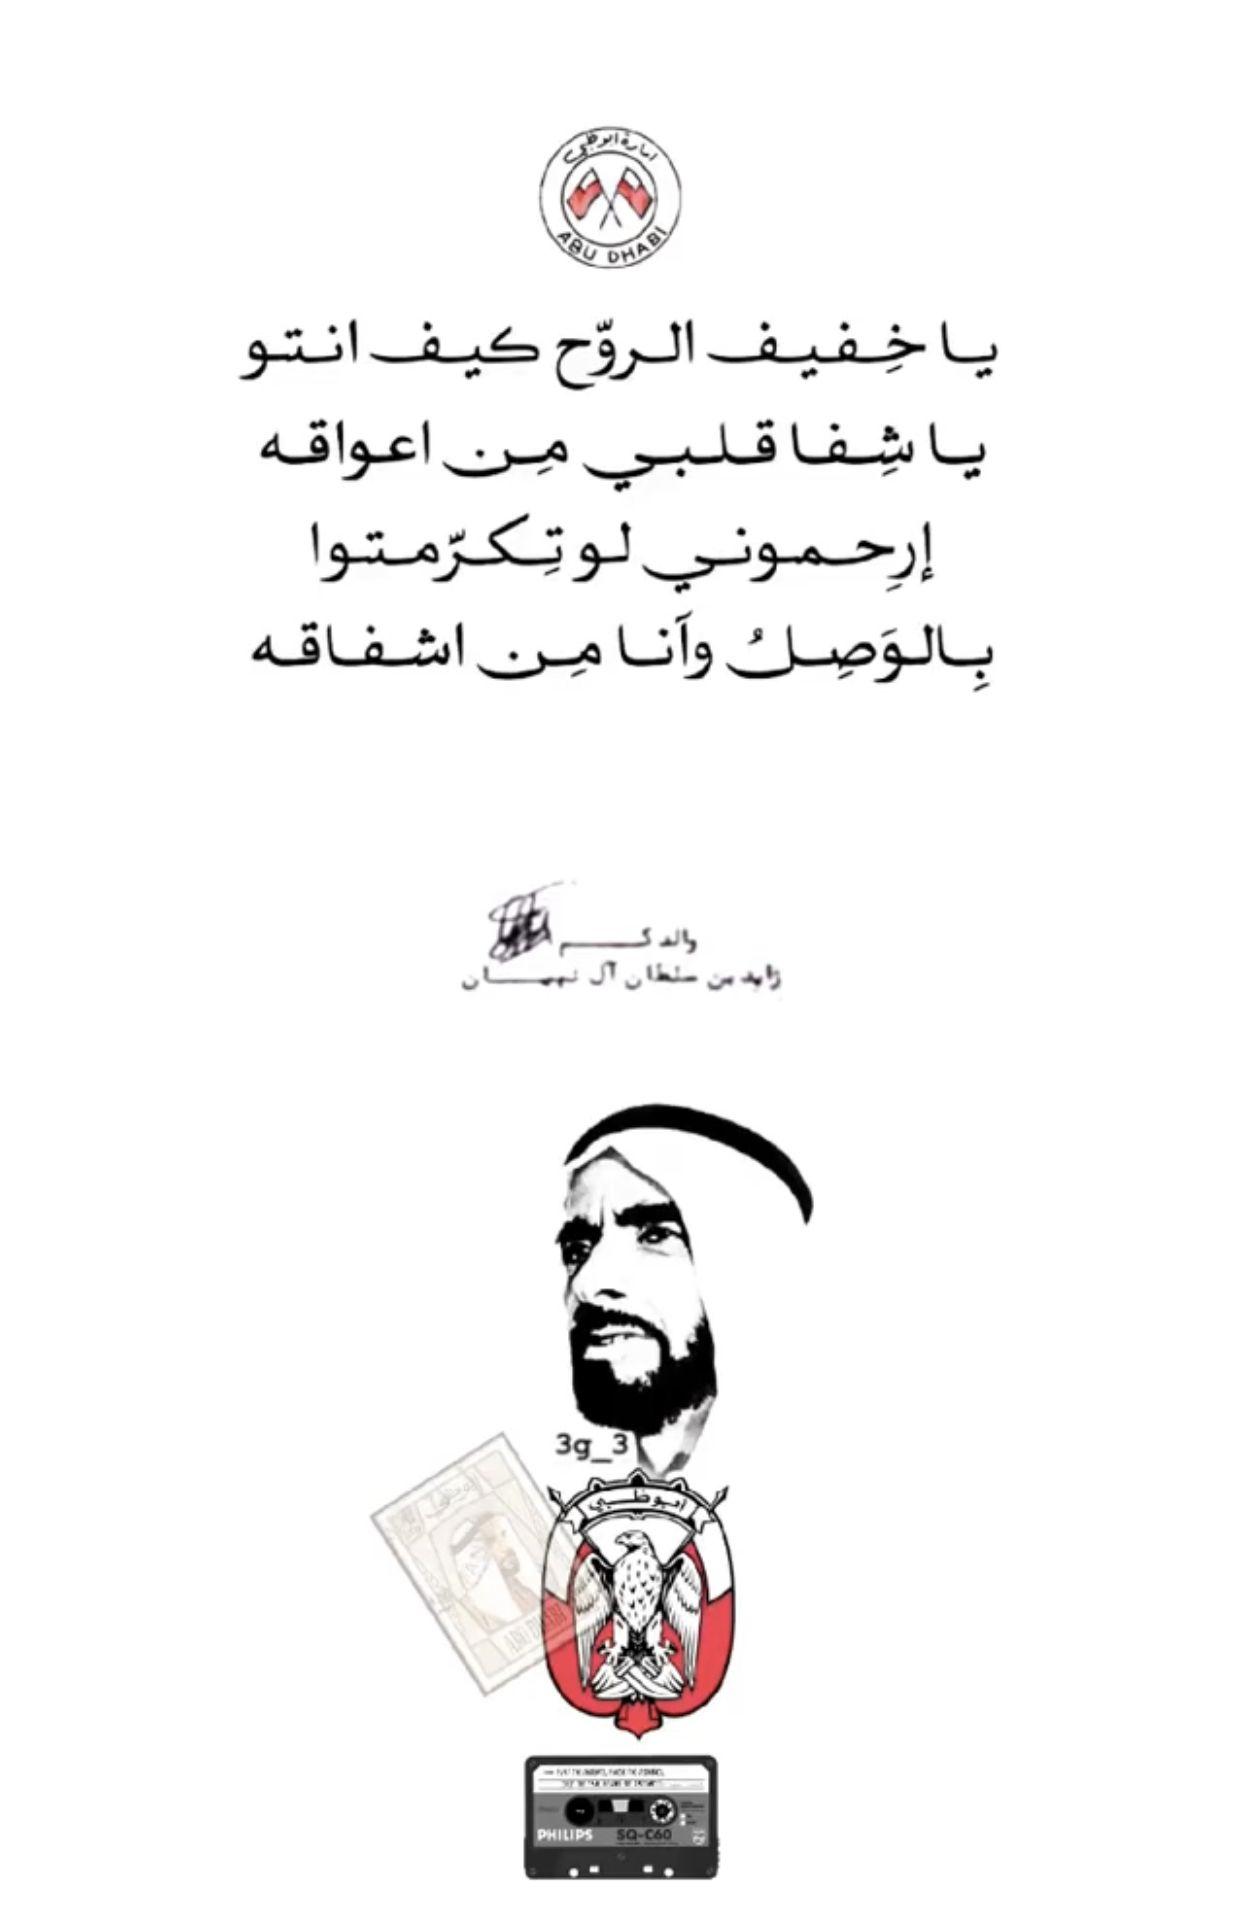 ياخفيف الروح Mood Quotes Arabic Love Quotes Quotes Deep